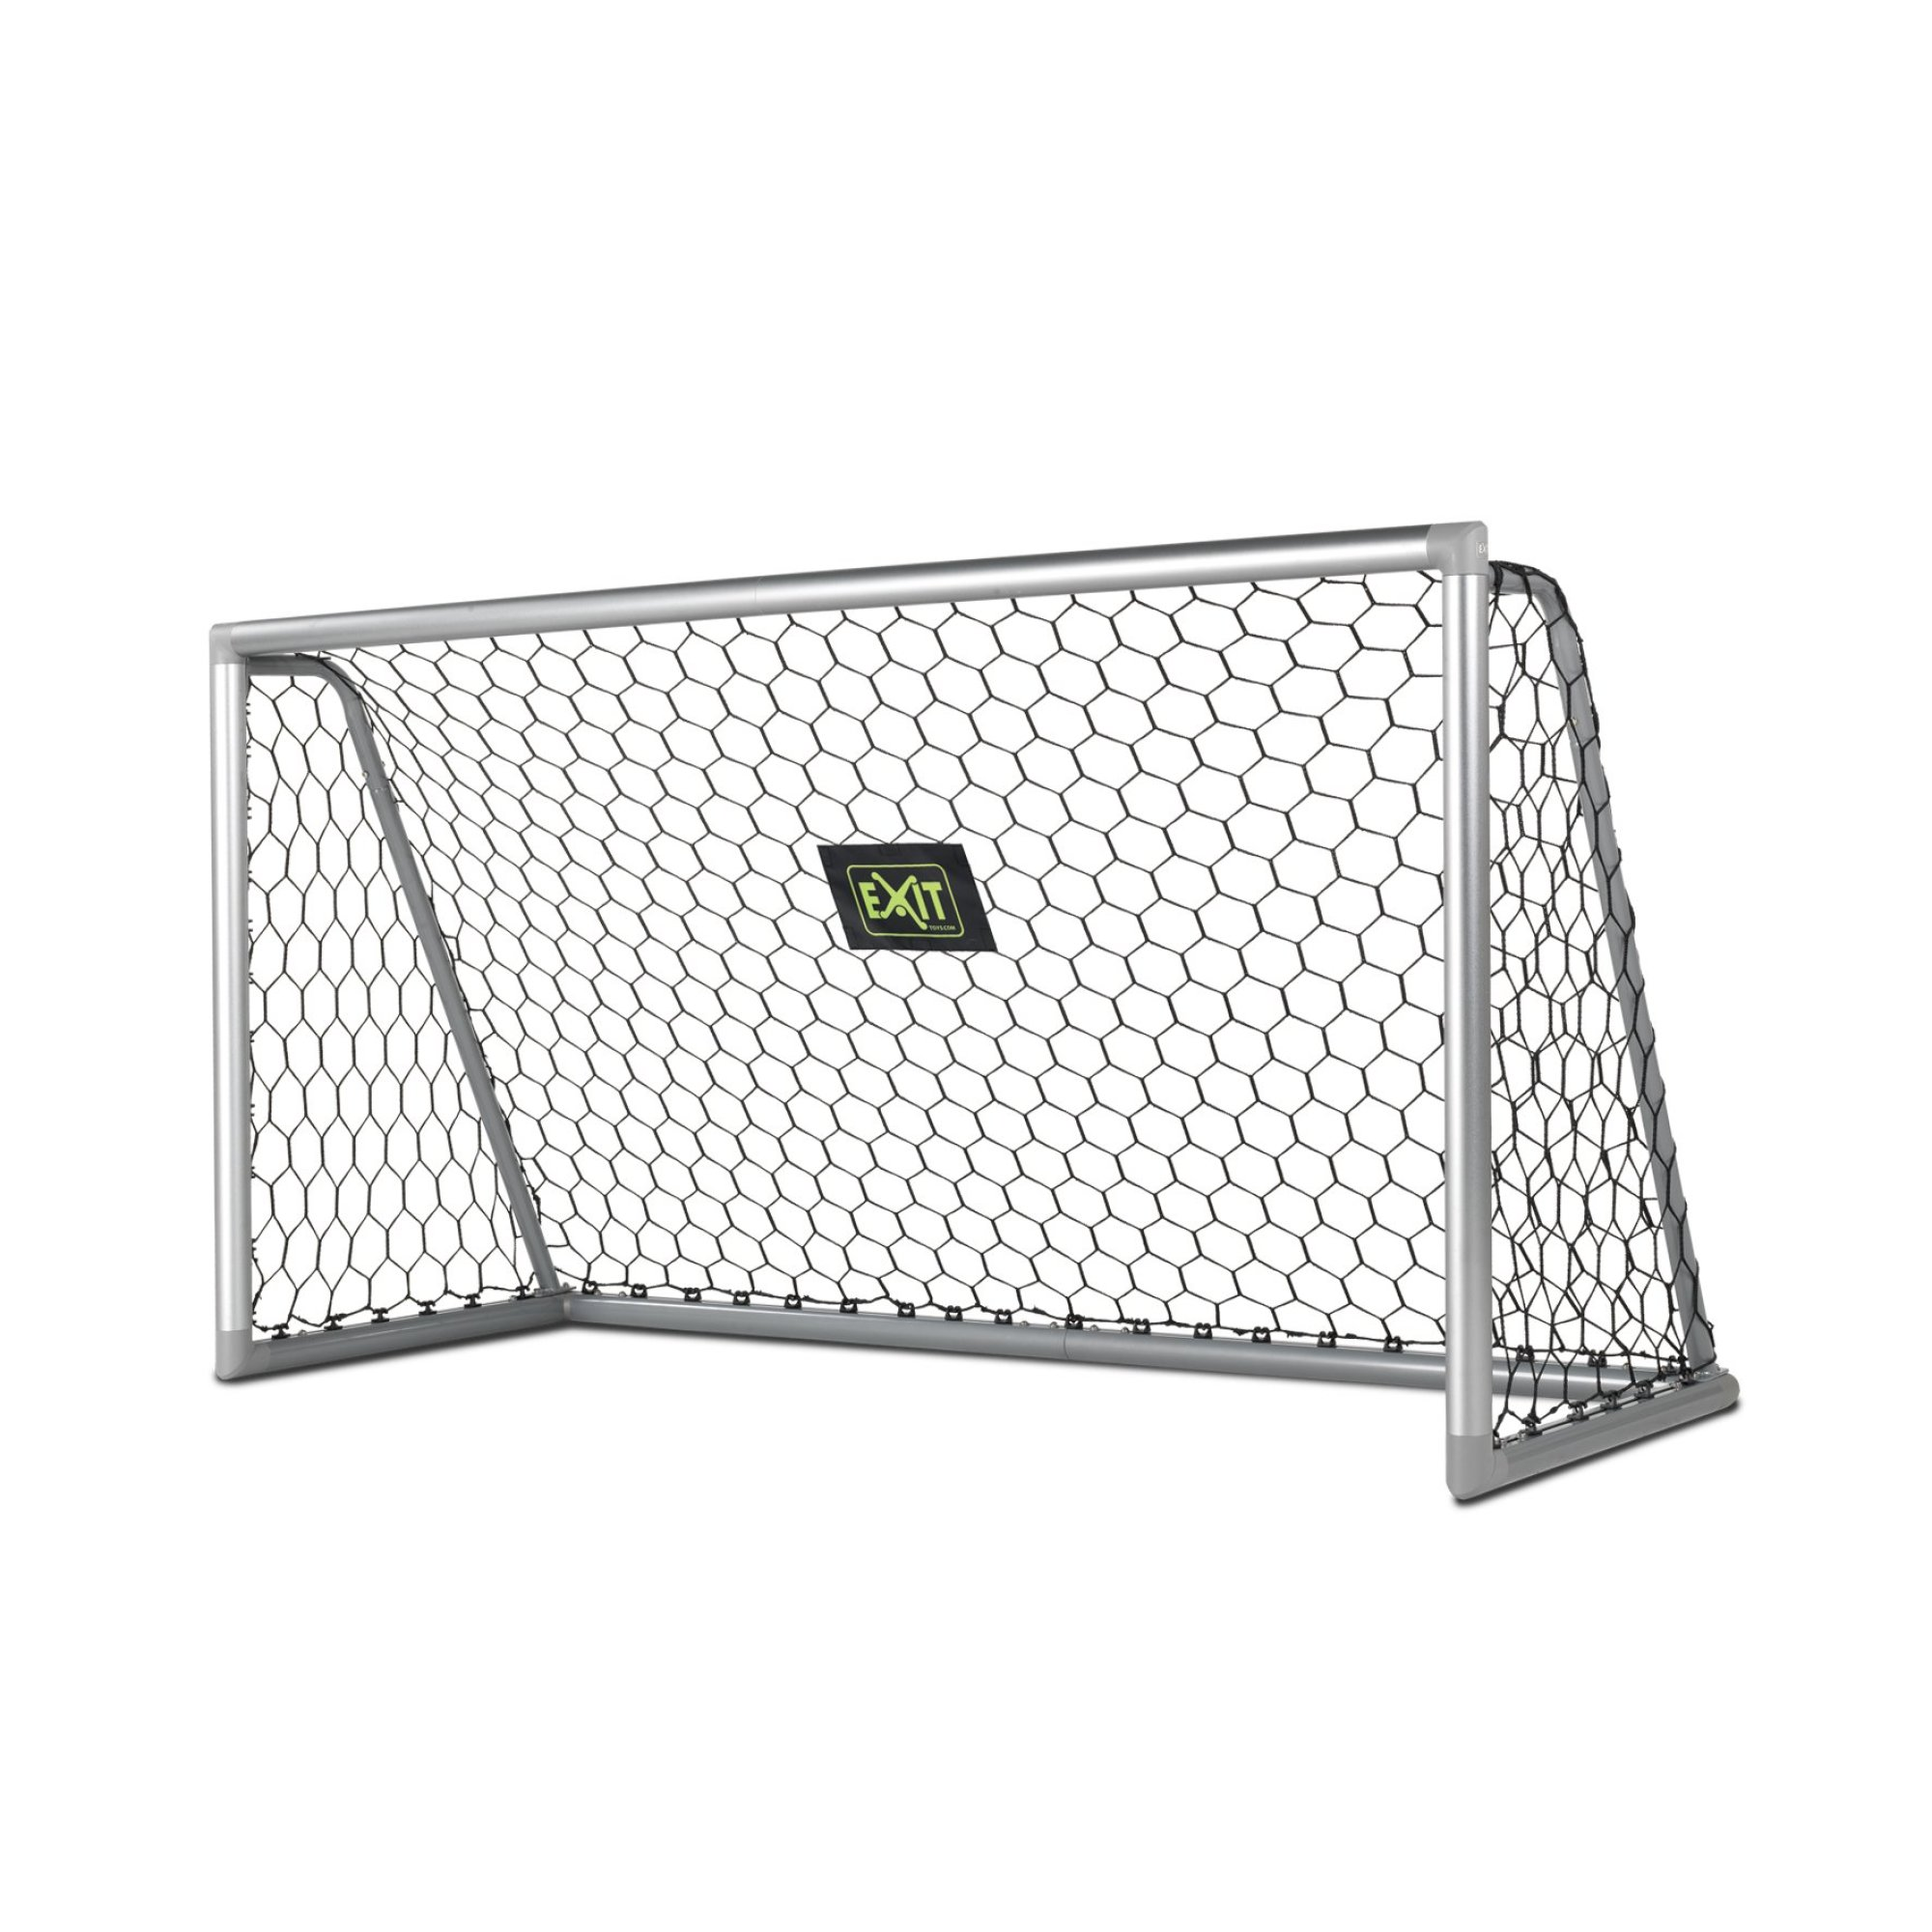 EXIT - Scala aluminum football goal (220x120cm) (42.22.12.00)